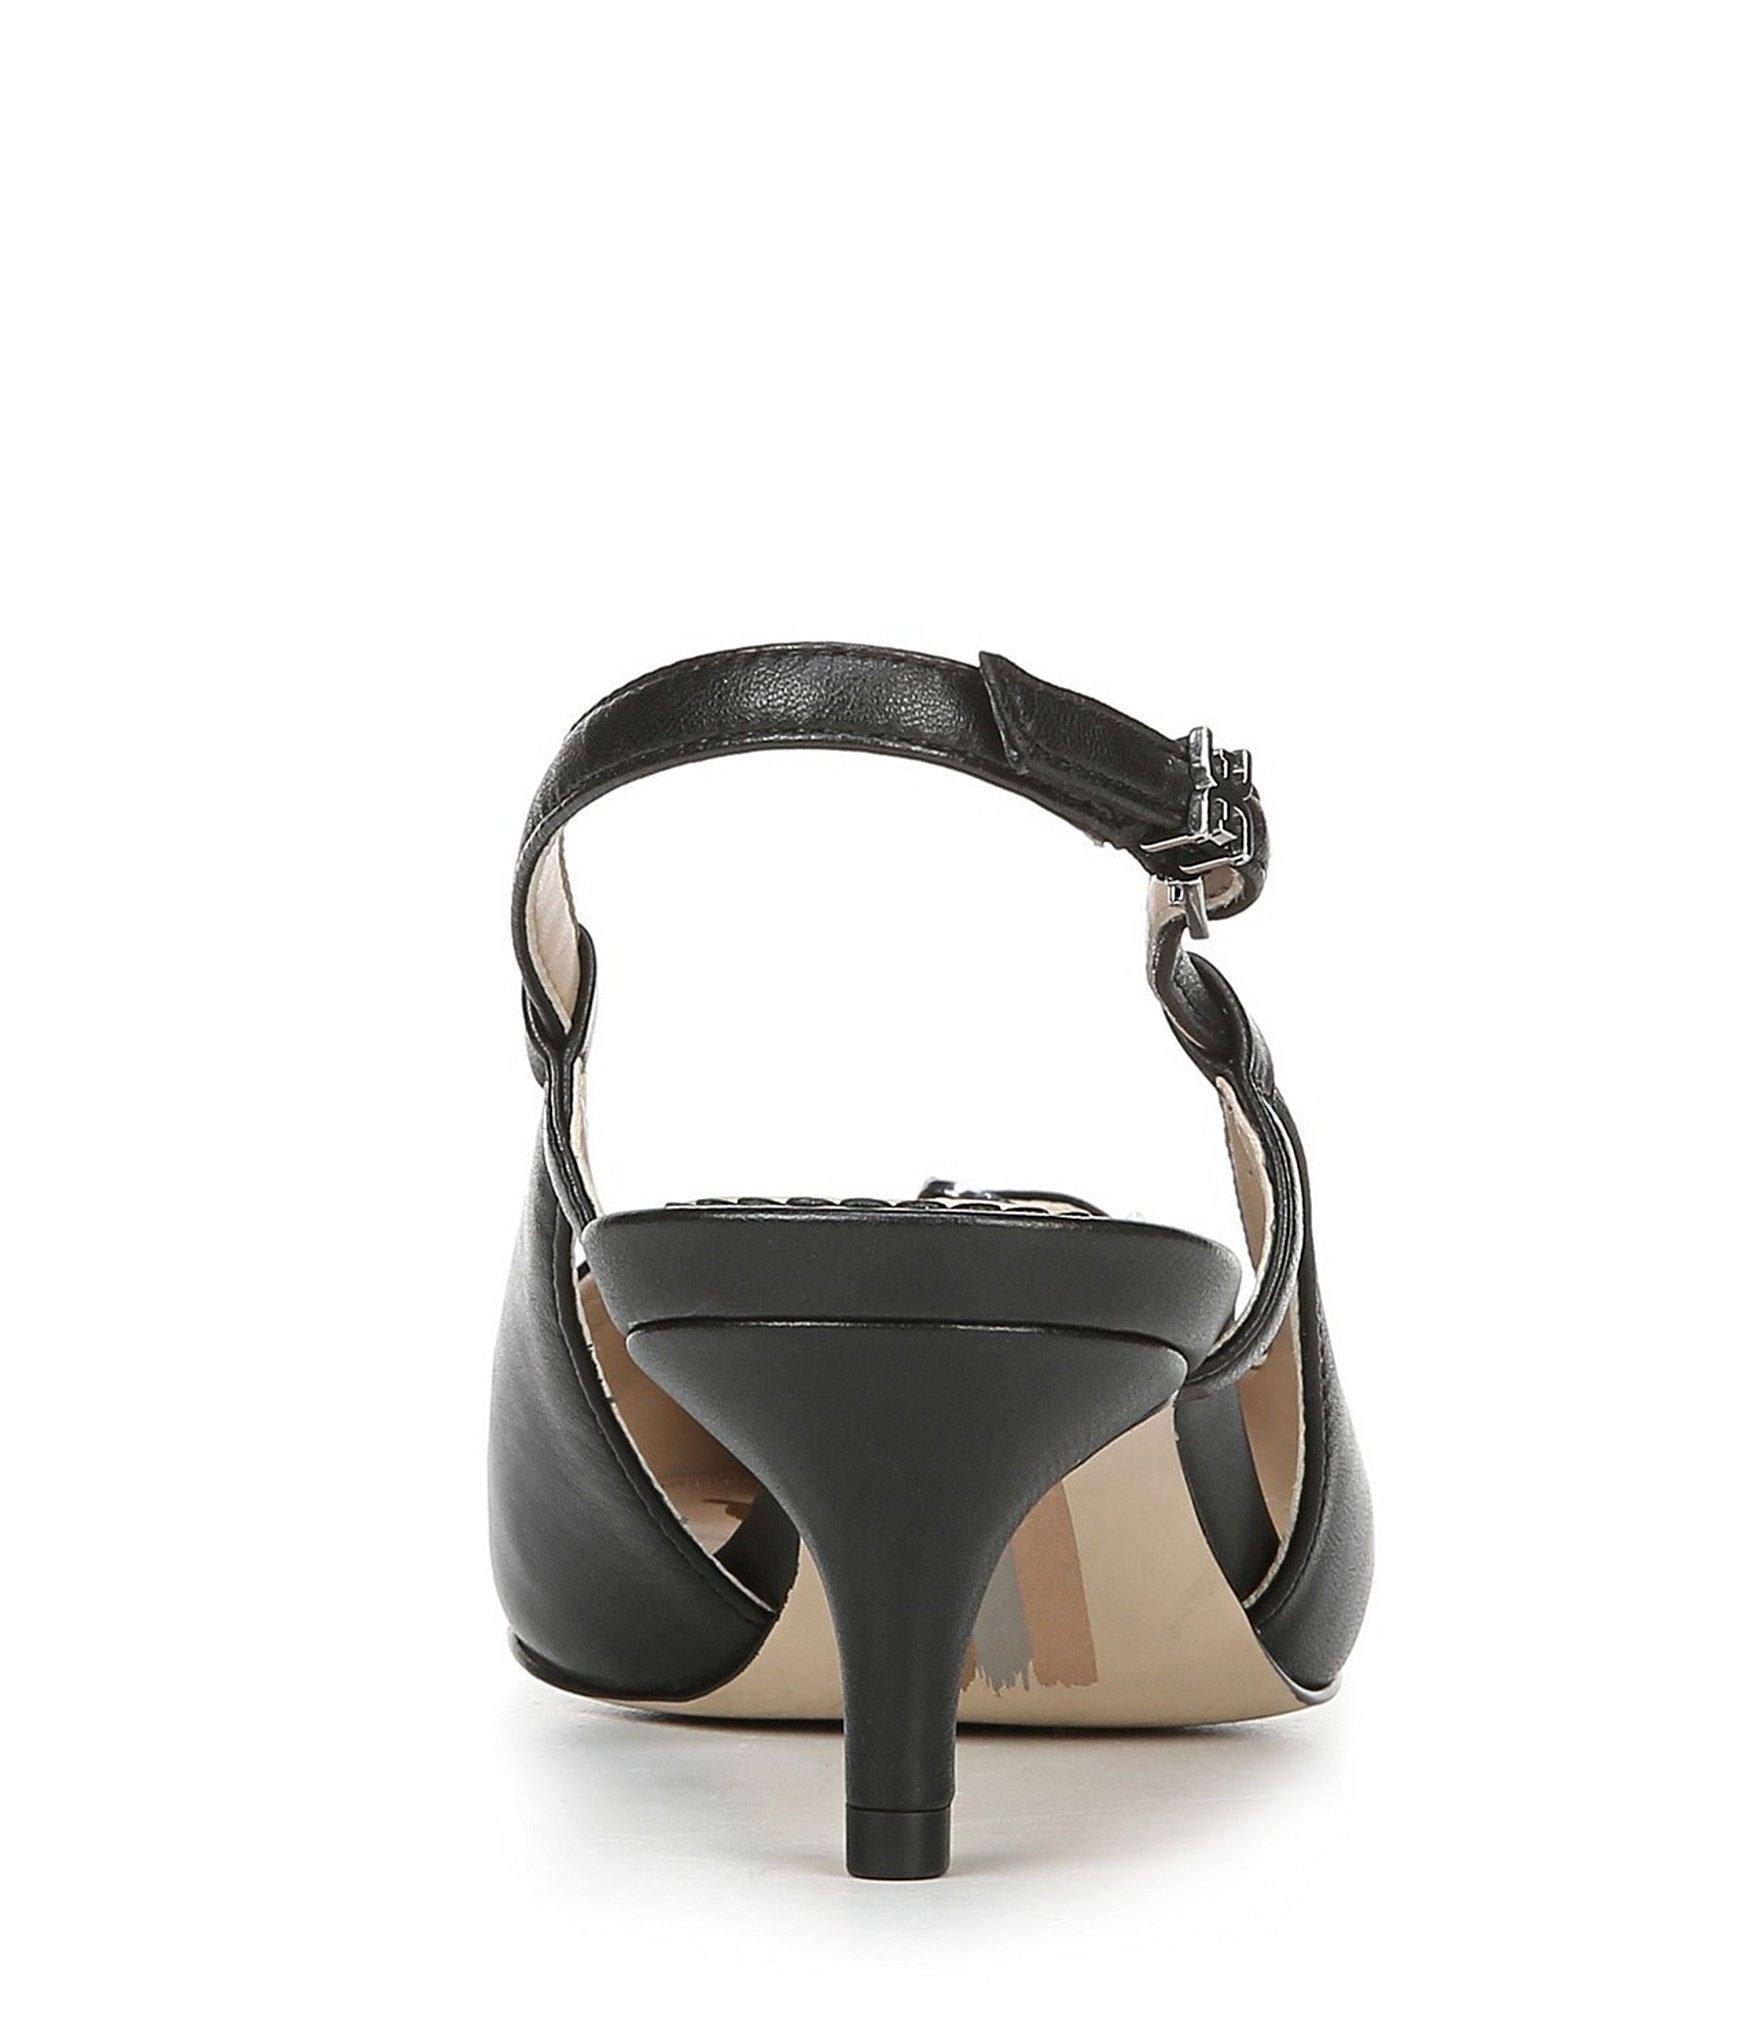 b5271cbe0f9 Women's Black Denia Leather Slingback Pumps